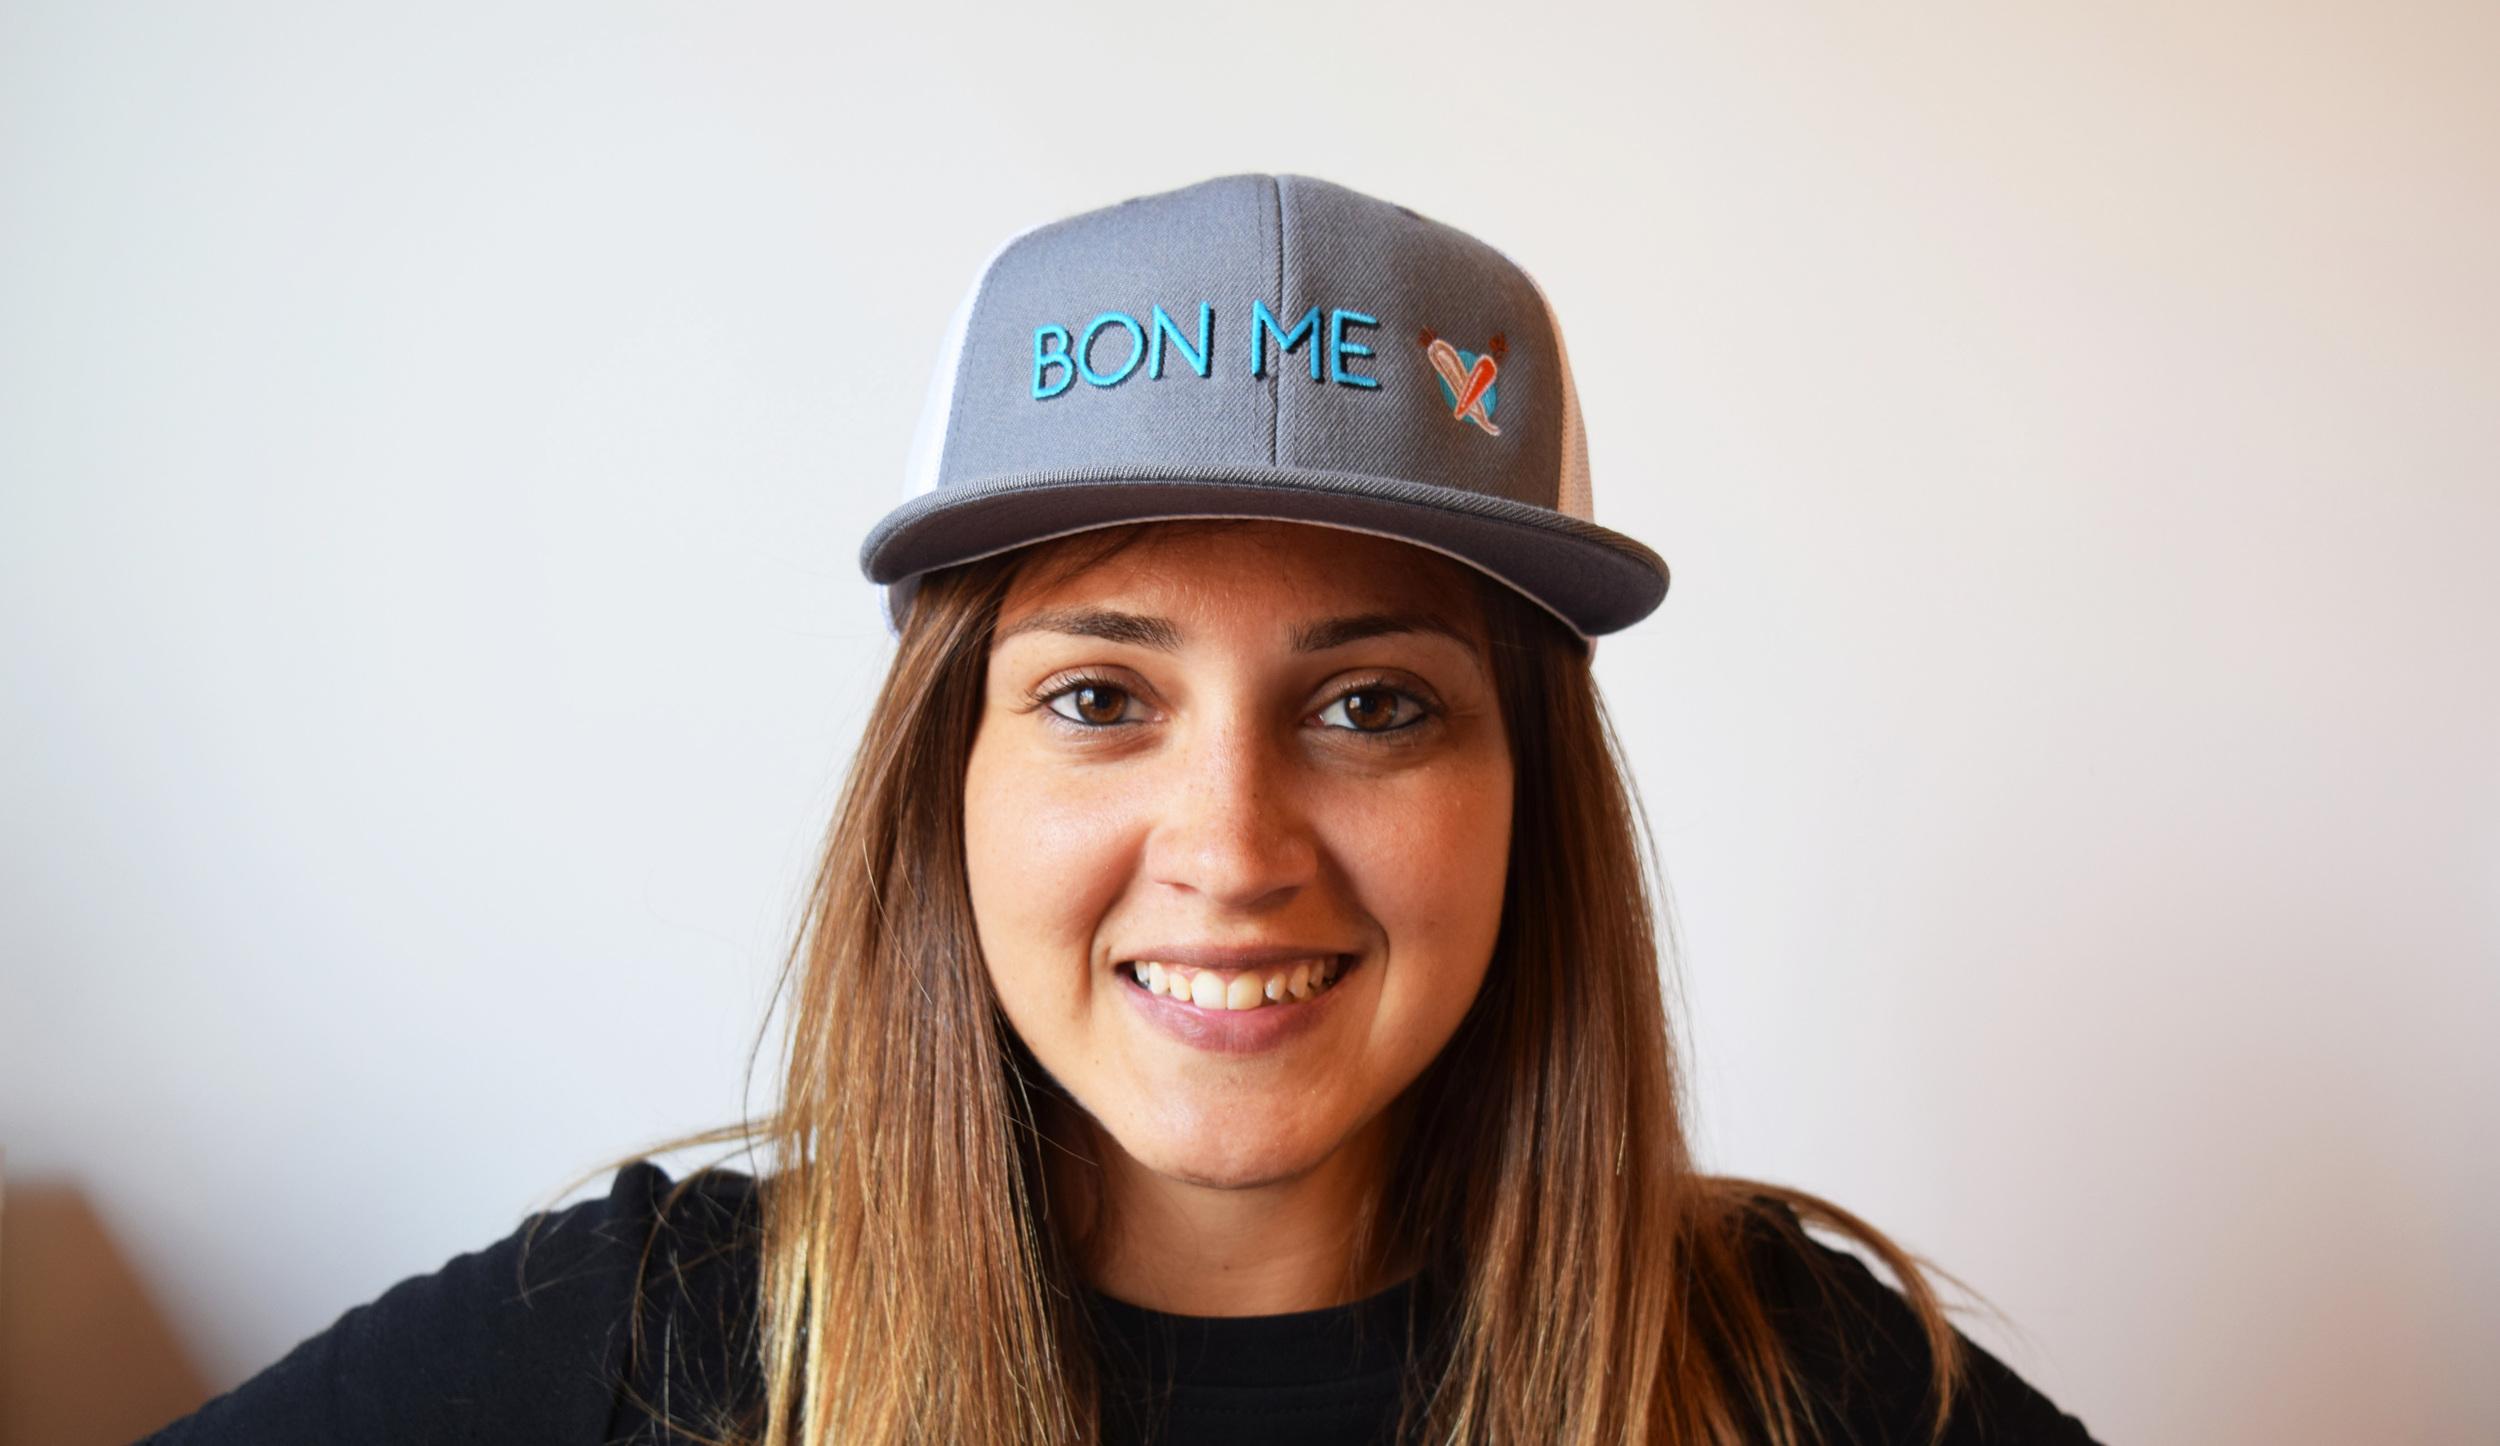 BON ME FLAT BASEBALL CAP   - $20